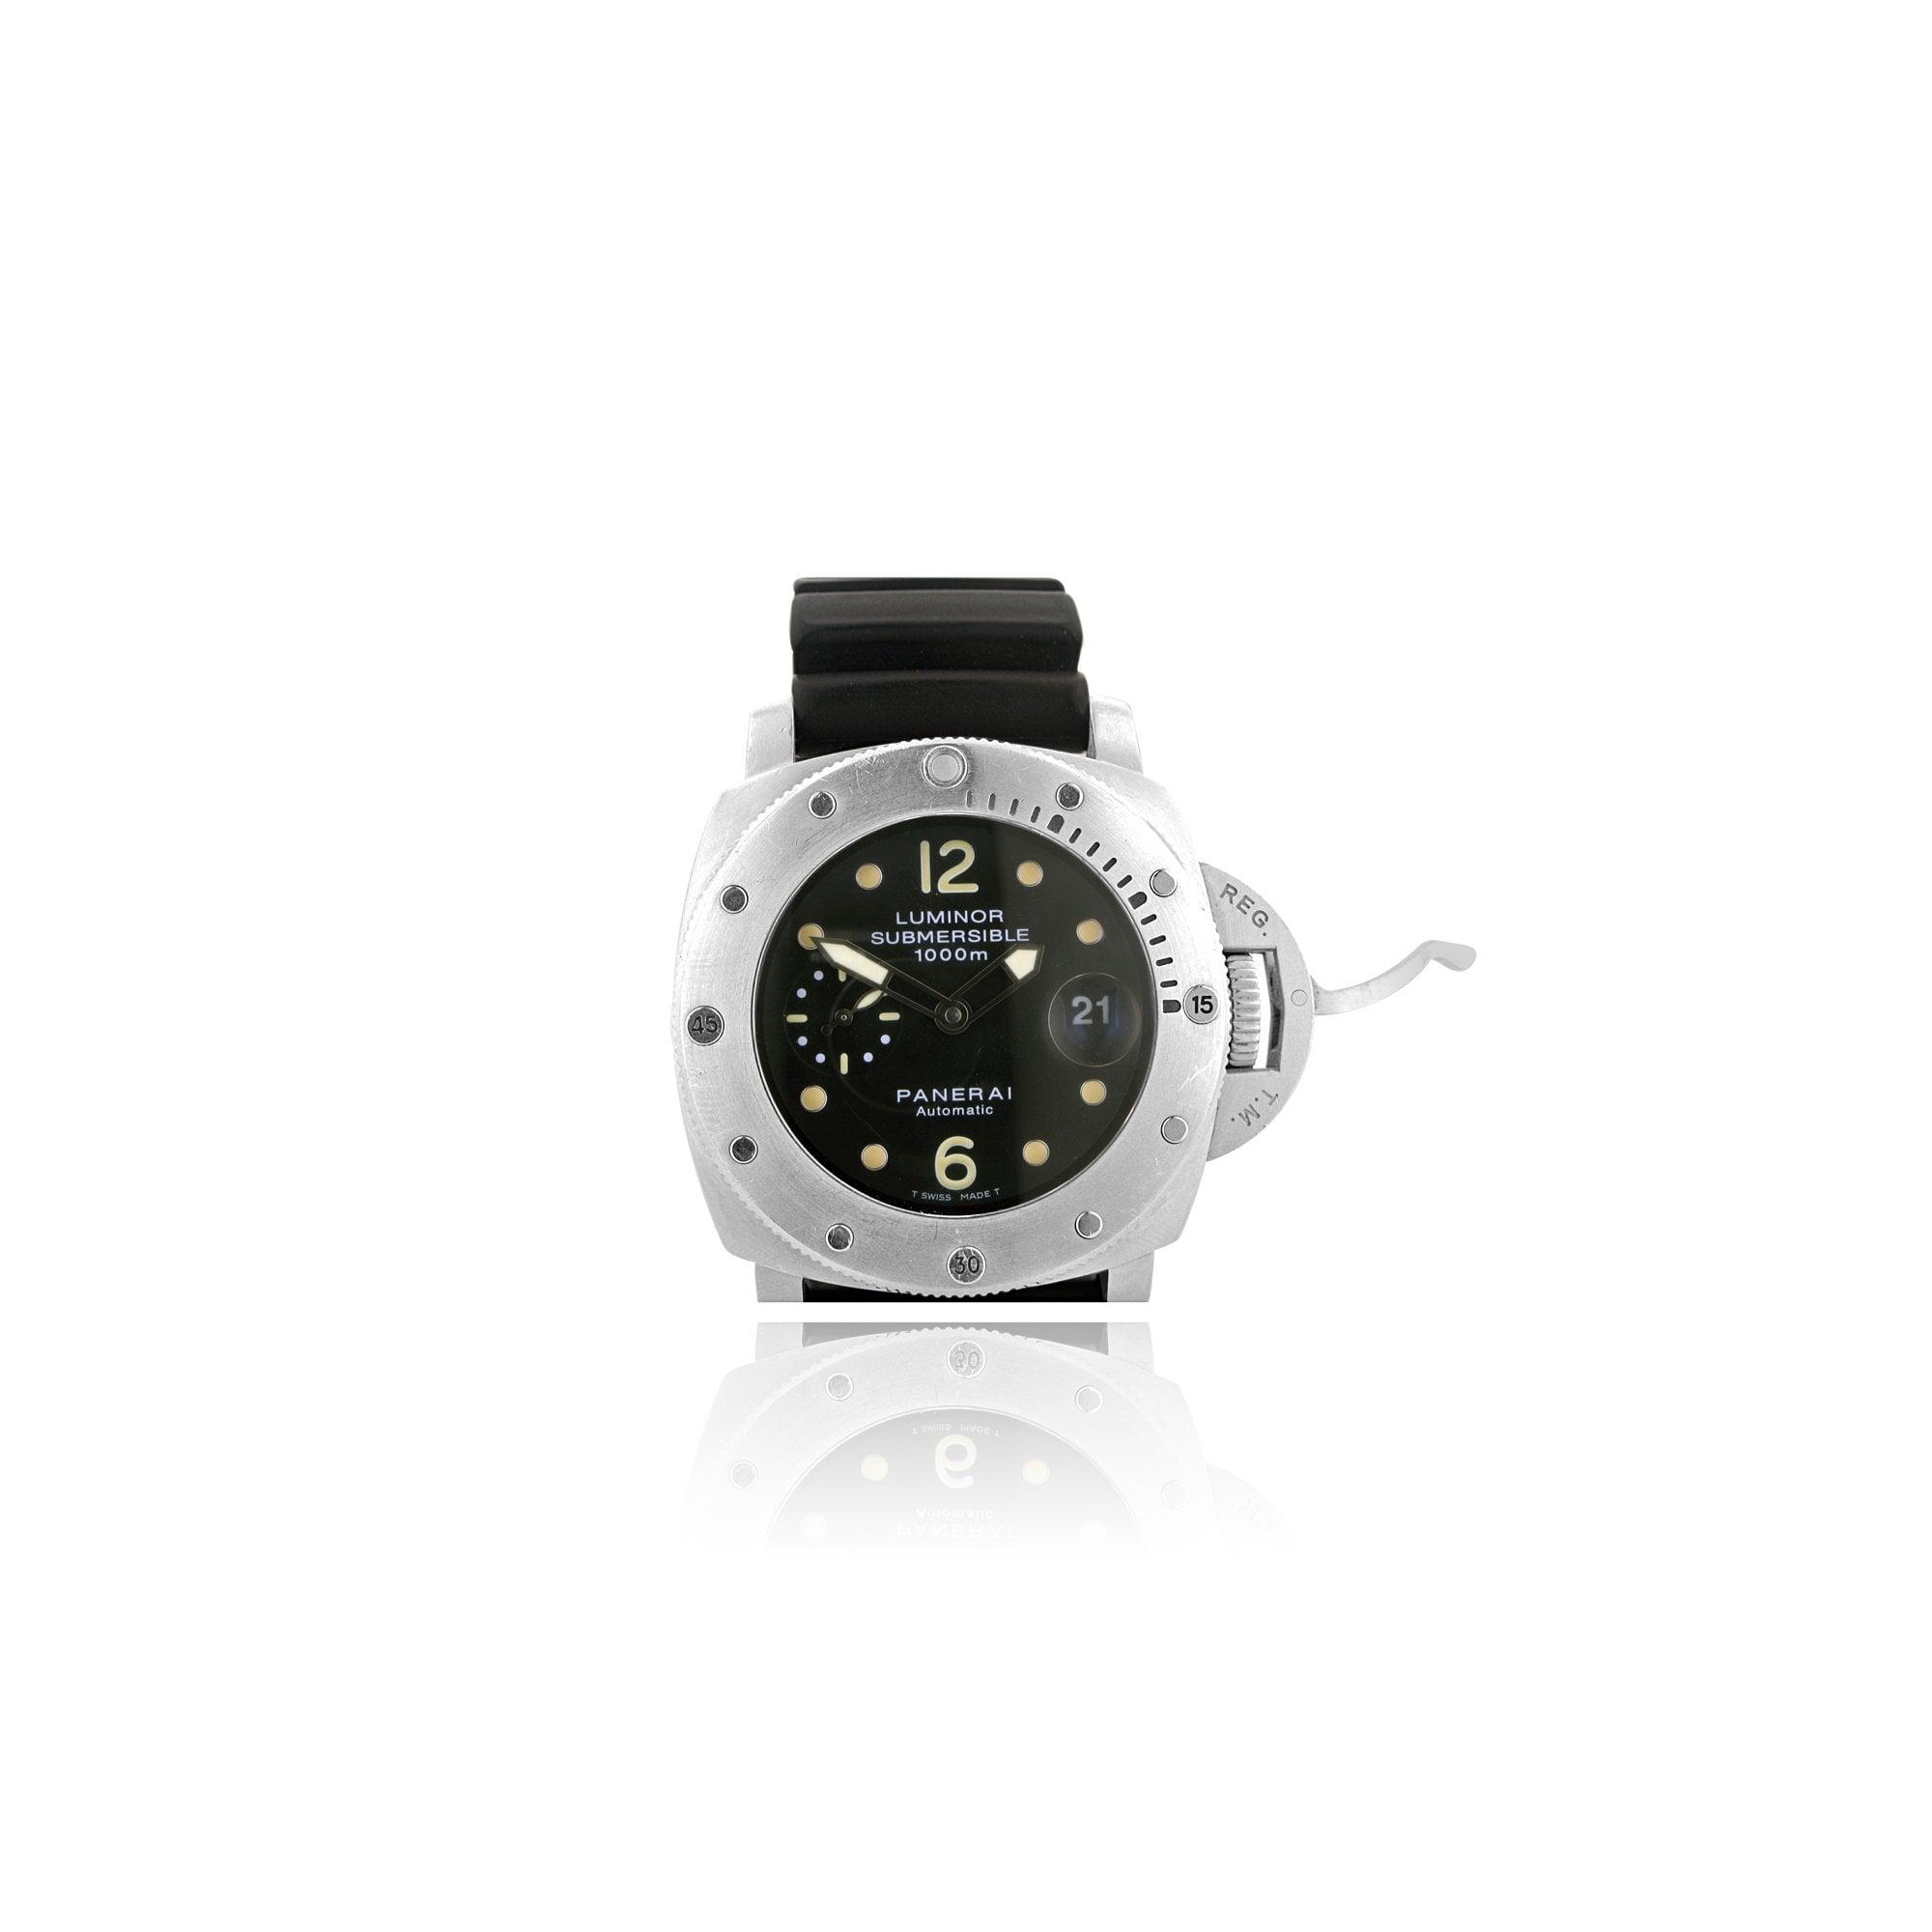 Panerai Luminor Submersible 1000M Professional Divers Watch ... e91c869dd831